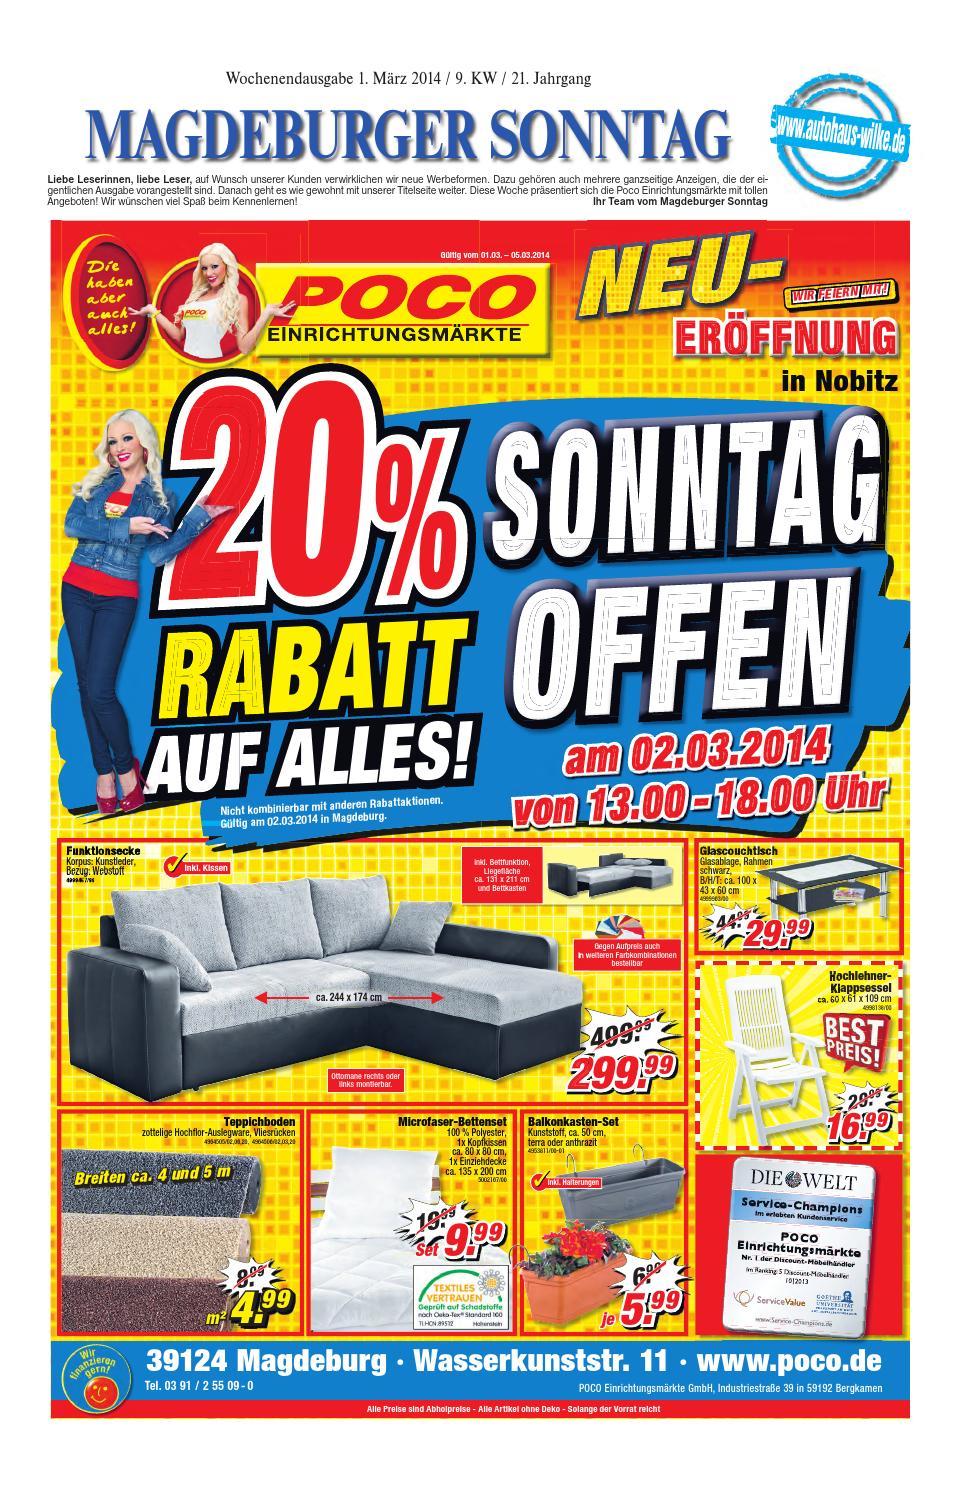 092014md by peter domnick issuu. Black Bedroom Furniture Sets. Home Design Ideas